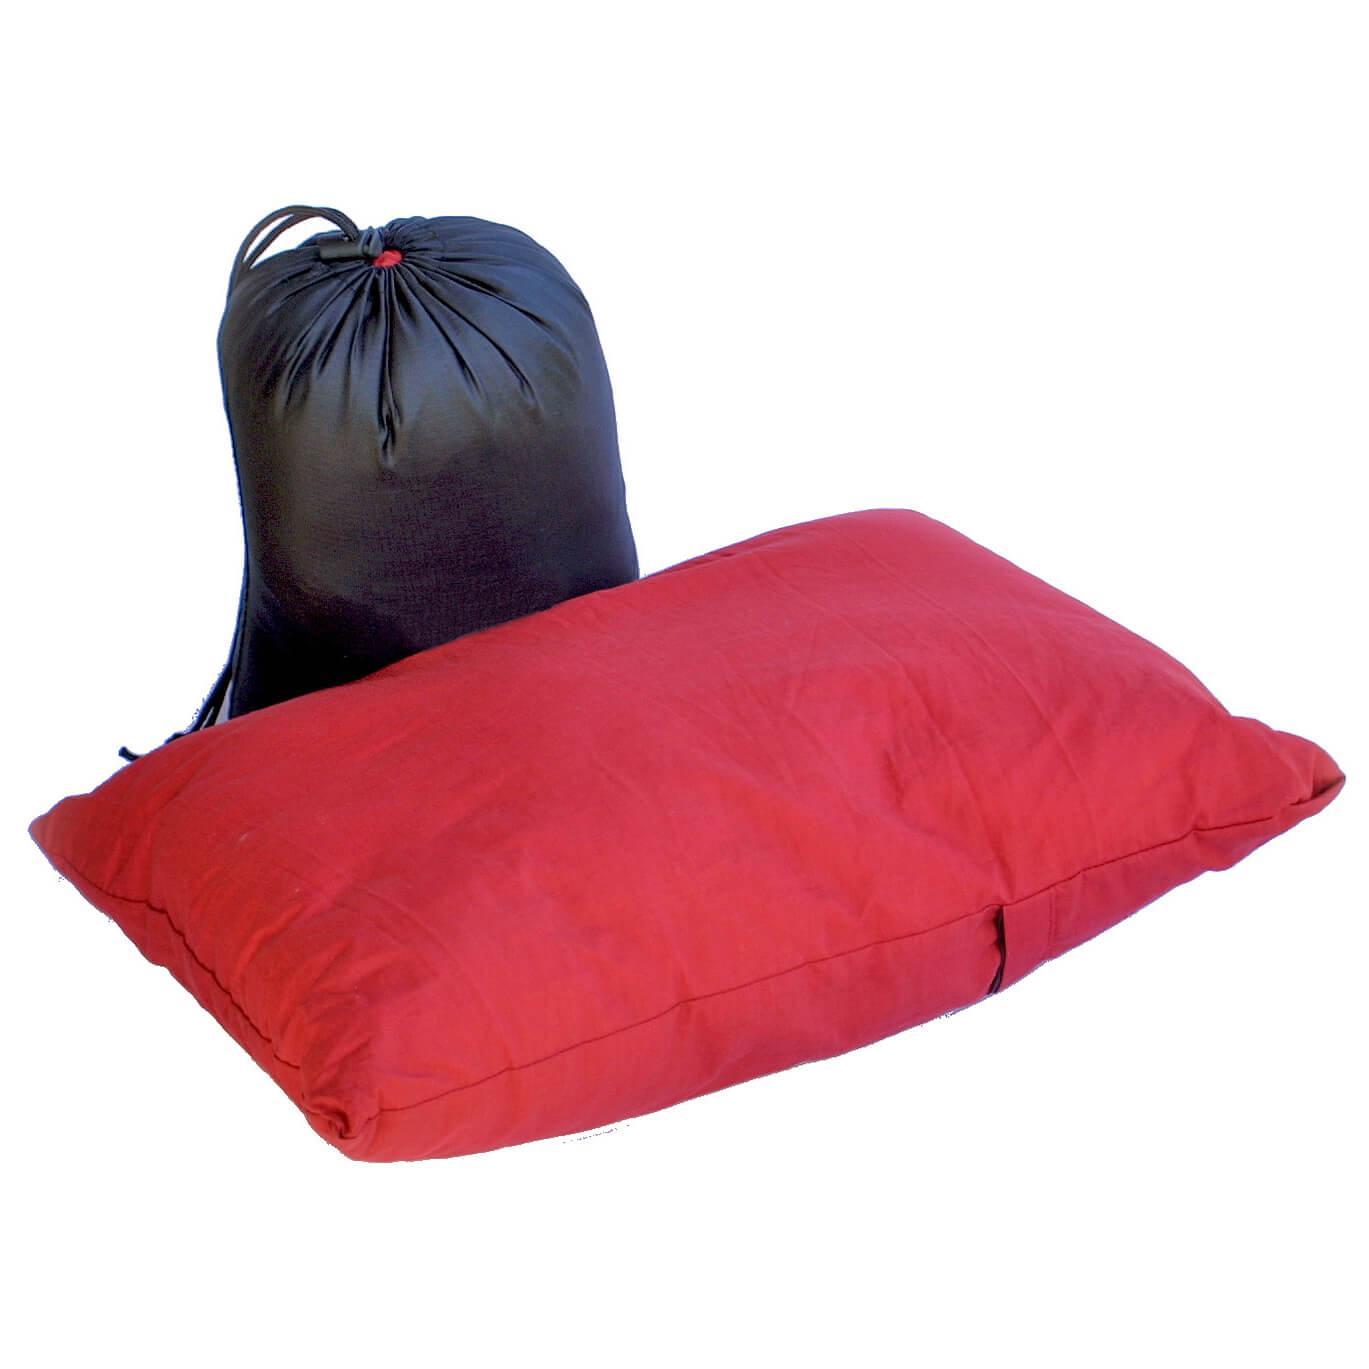 acheter en ligne basicnature coussin de voyage coussin. Black Bedroom Furniture Sets. Home Design Ideas